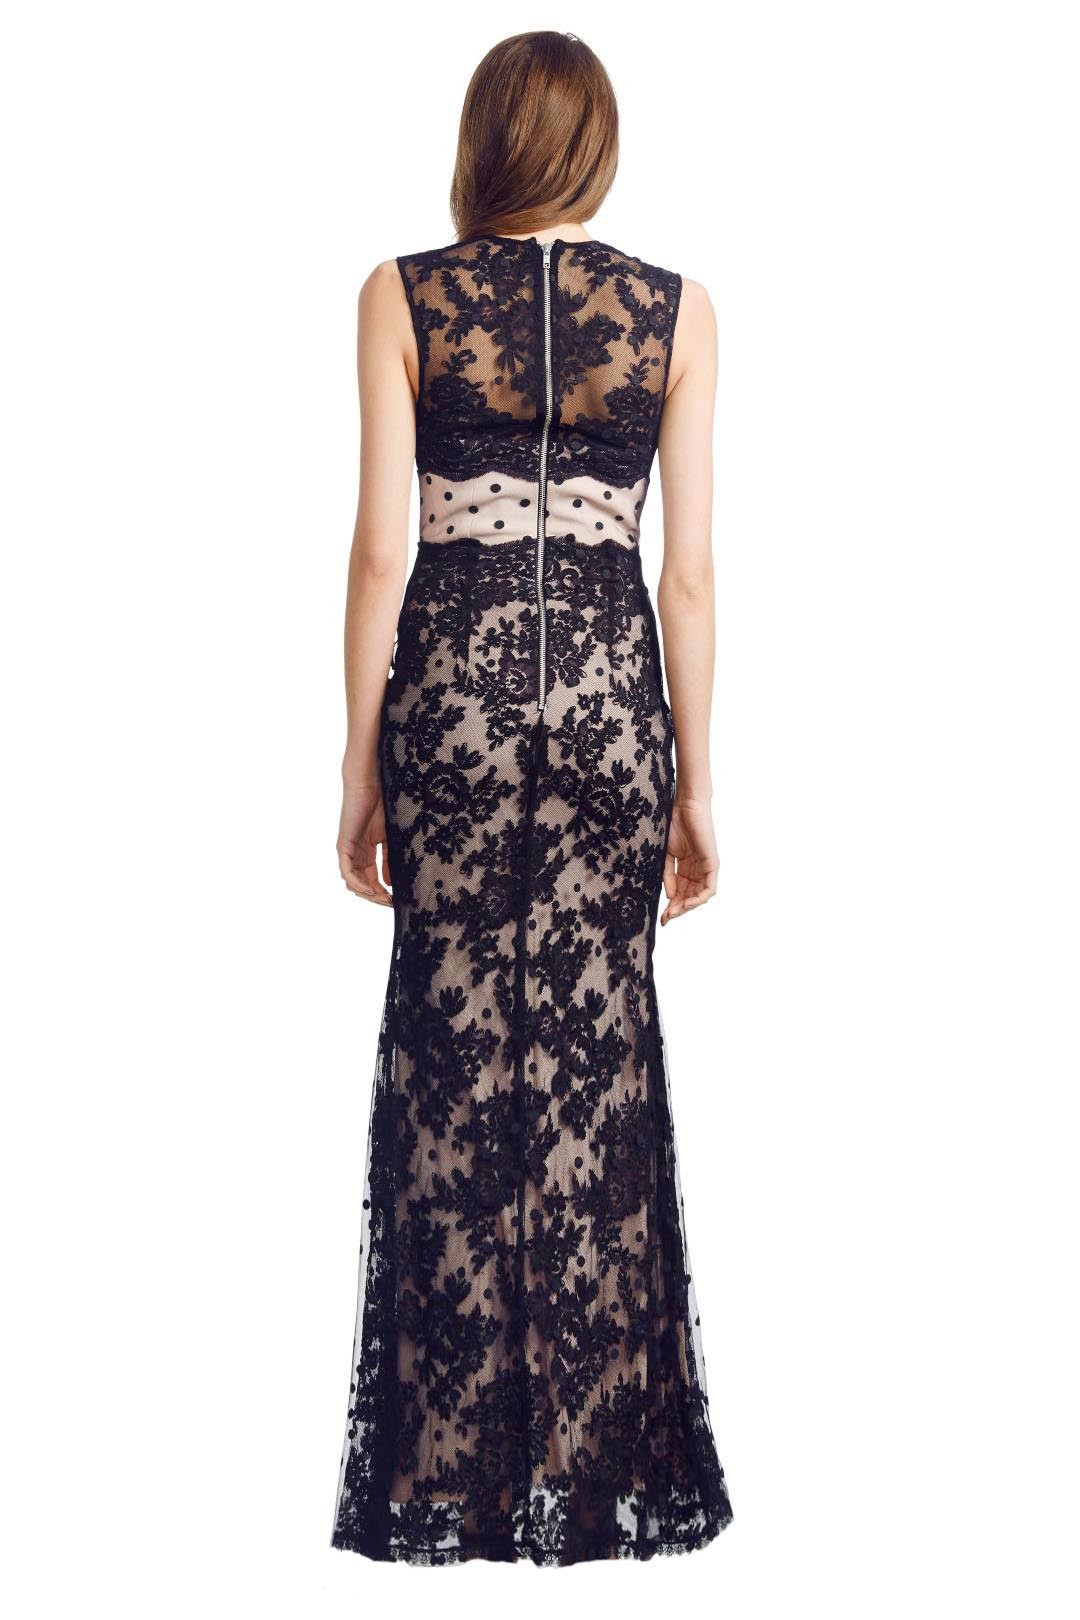 Alex Perry Ancelina Gown Rent Designer Dresses Online